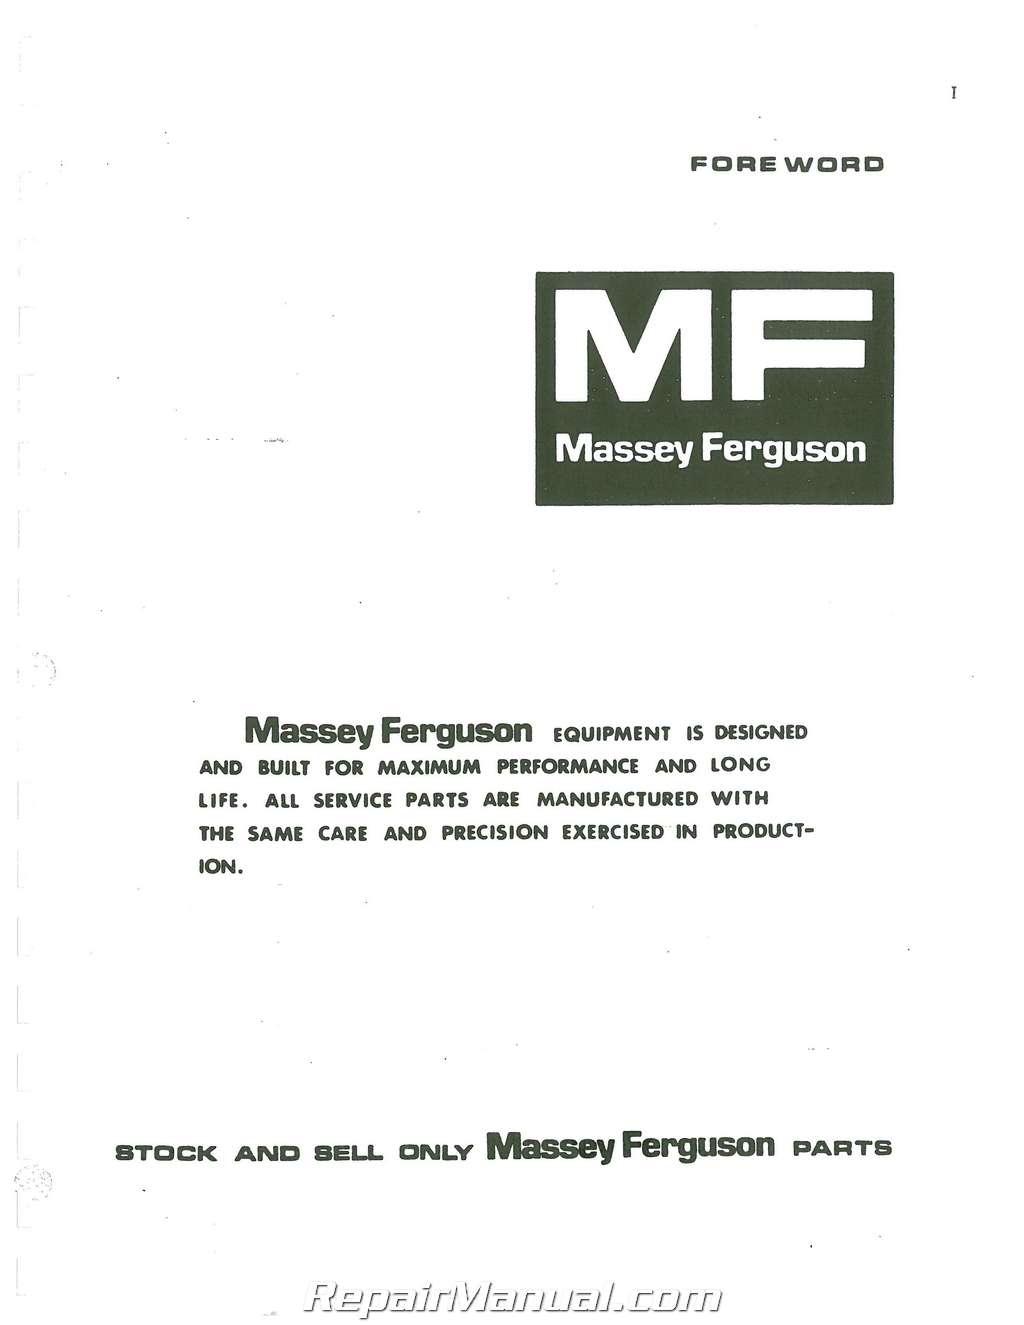 massey ferguson 245 parts manual rh repairmanual com massey ferguson 245 operator's manual Massey Ferguson 245 Orchard Tractor